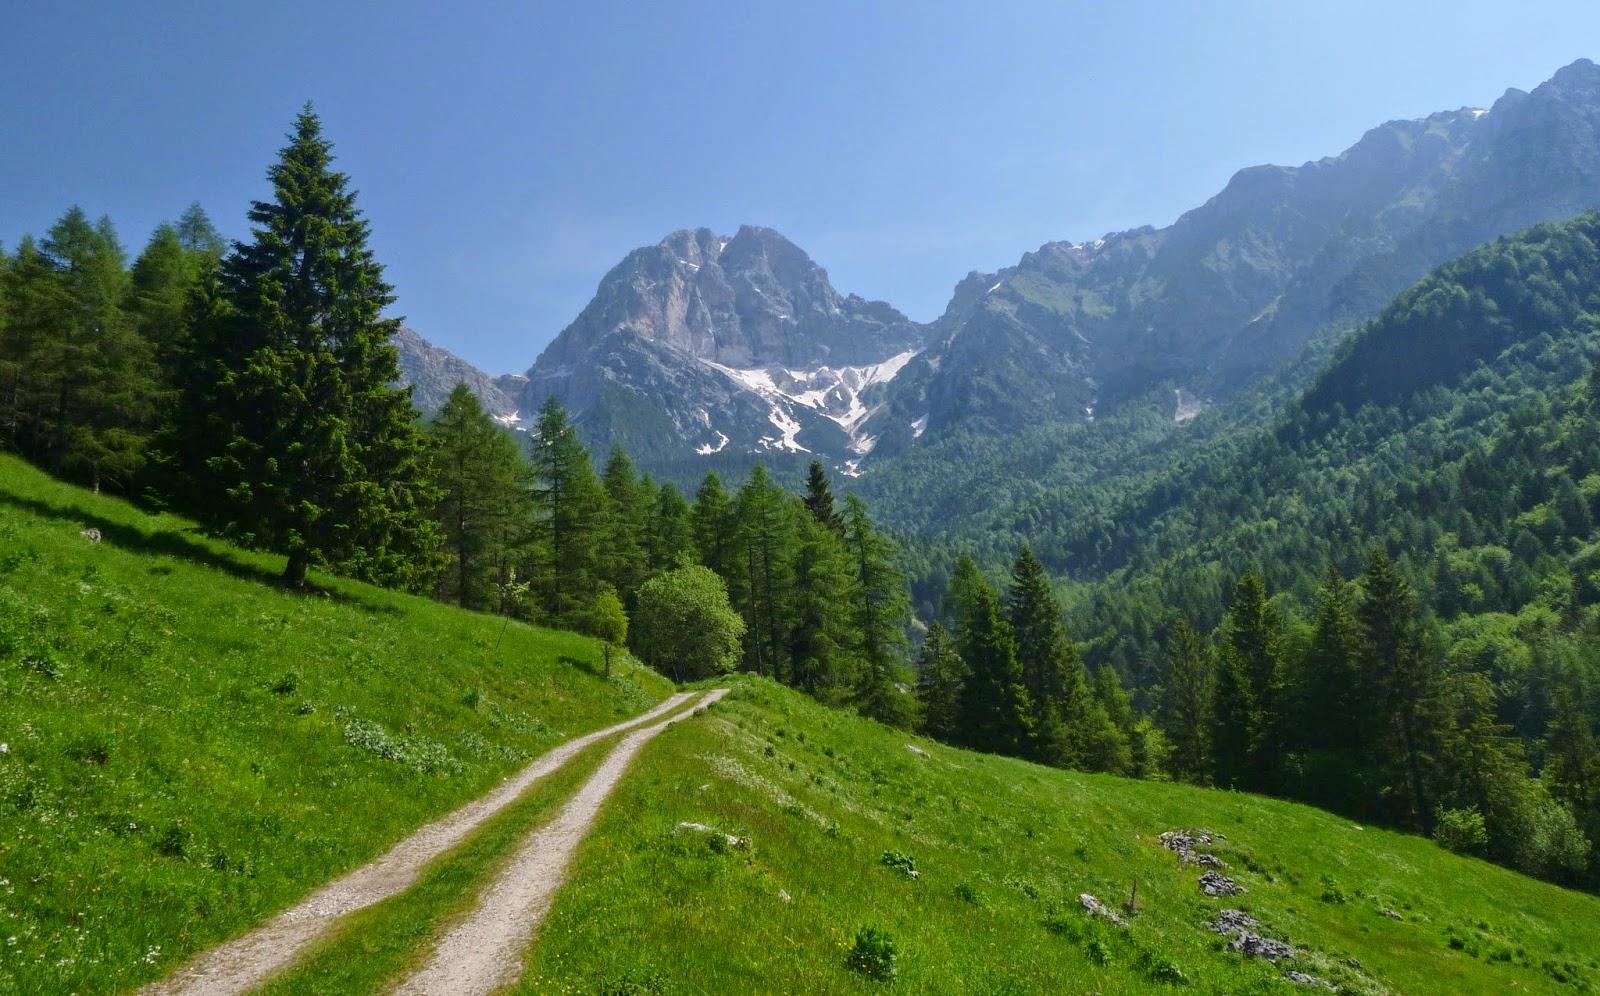 sentiero-val-zemola-veneto-italy-movie-walks